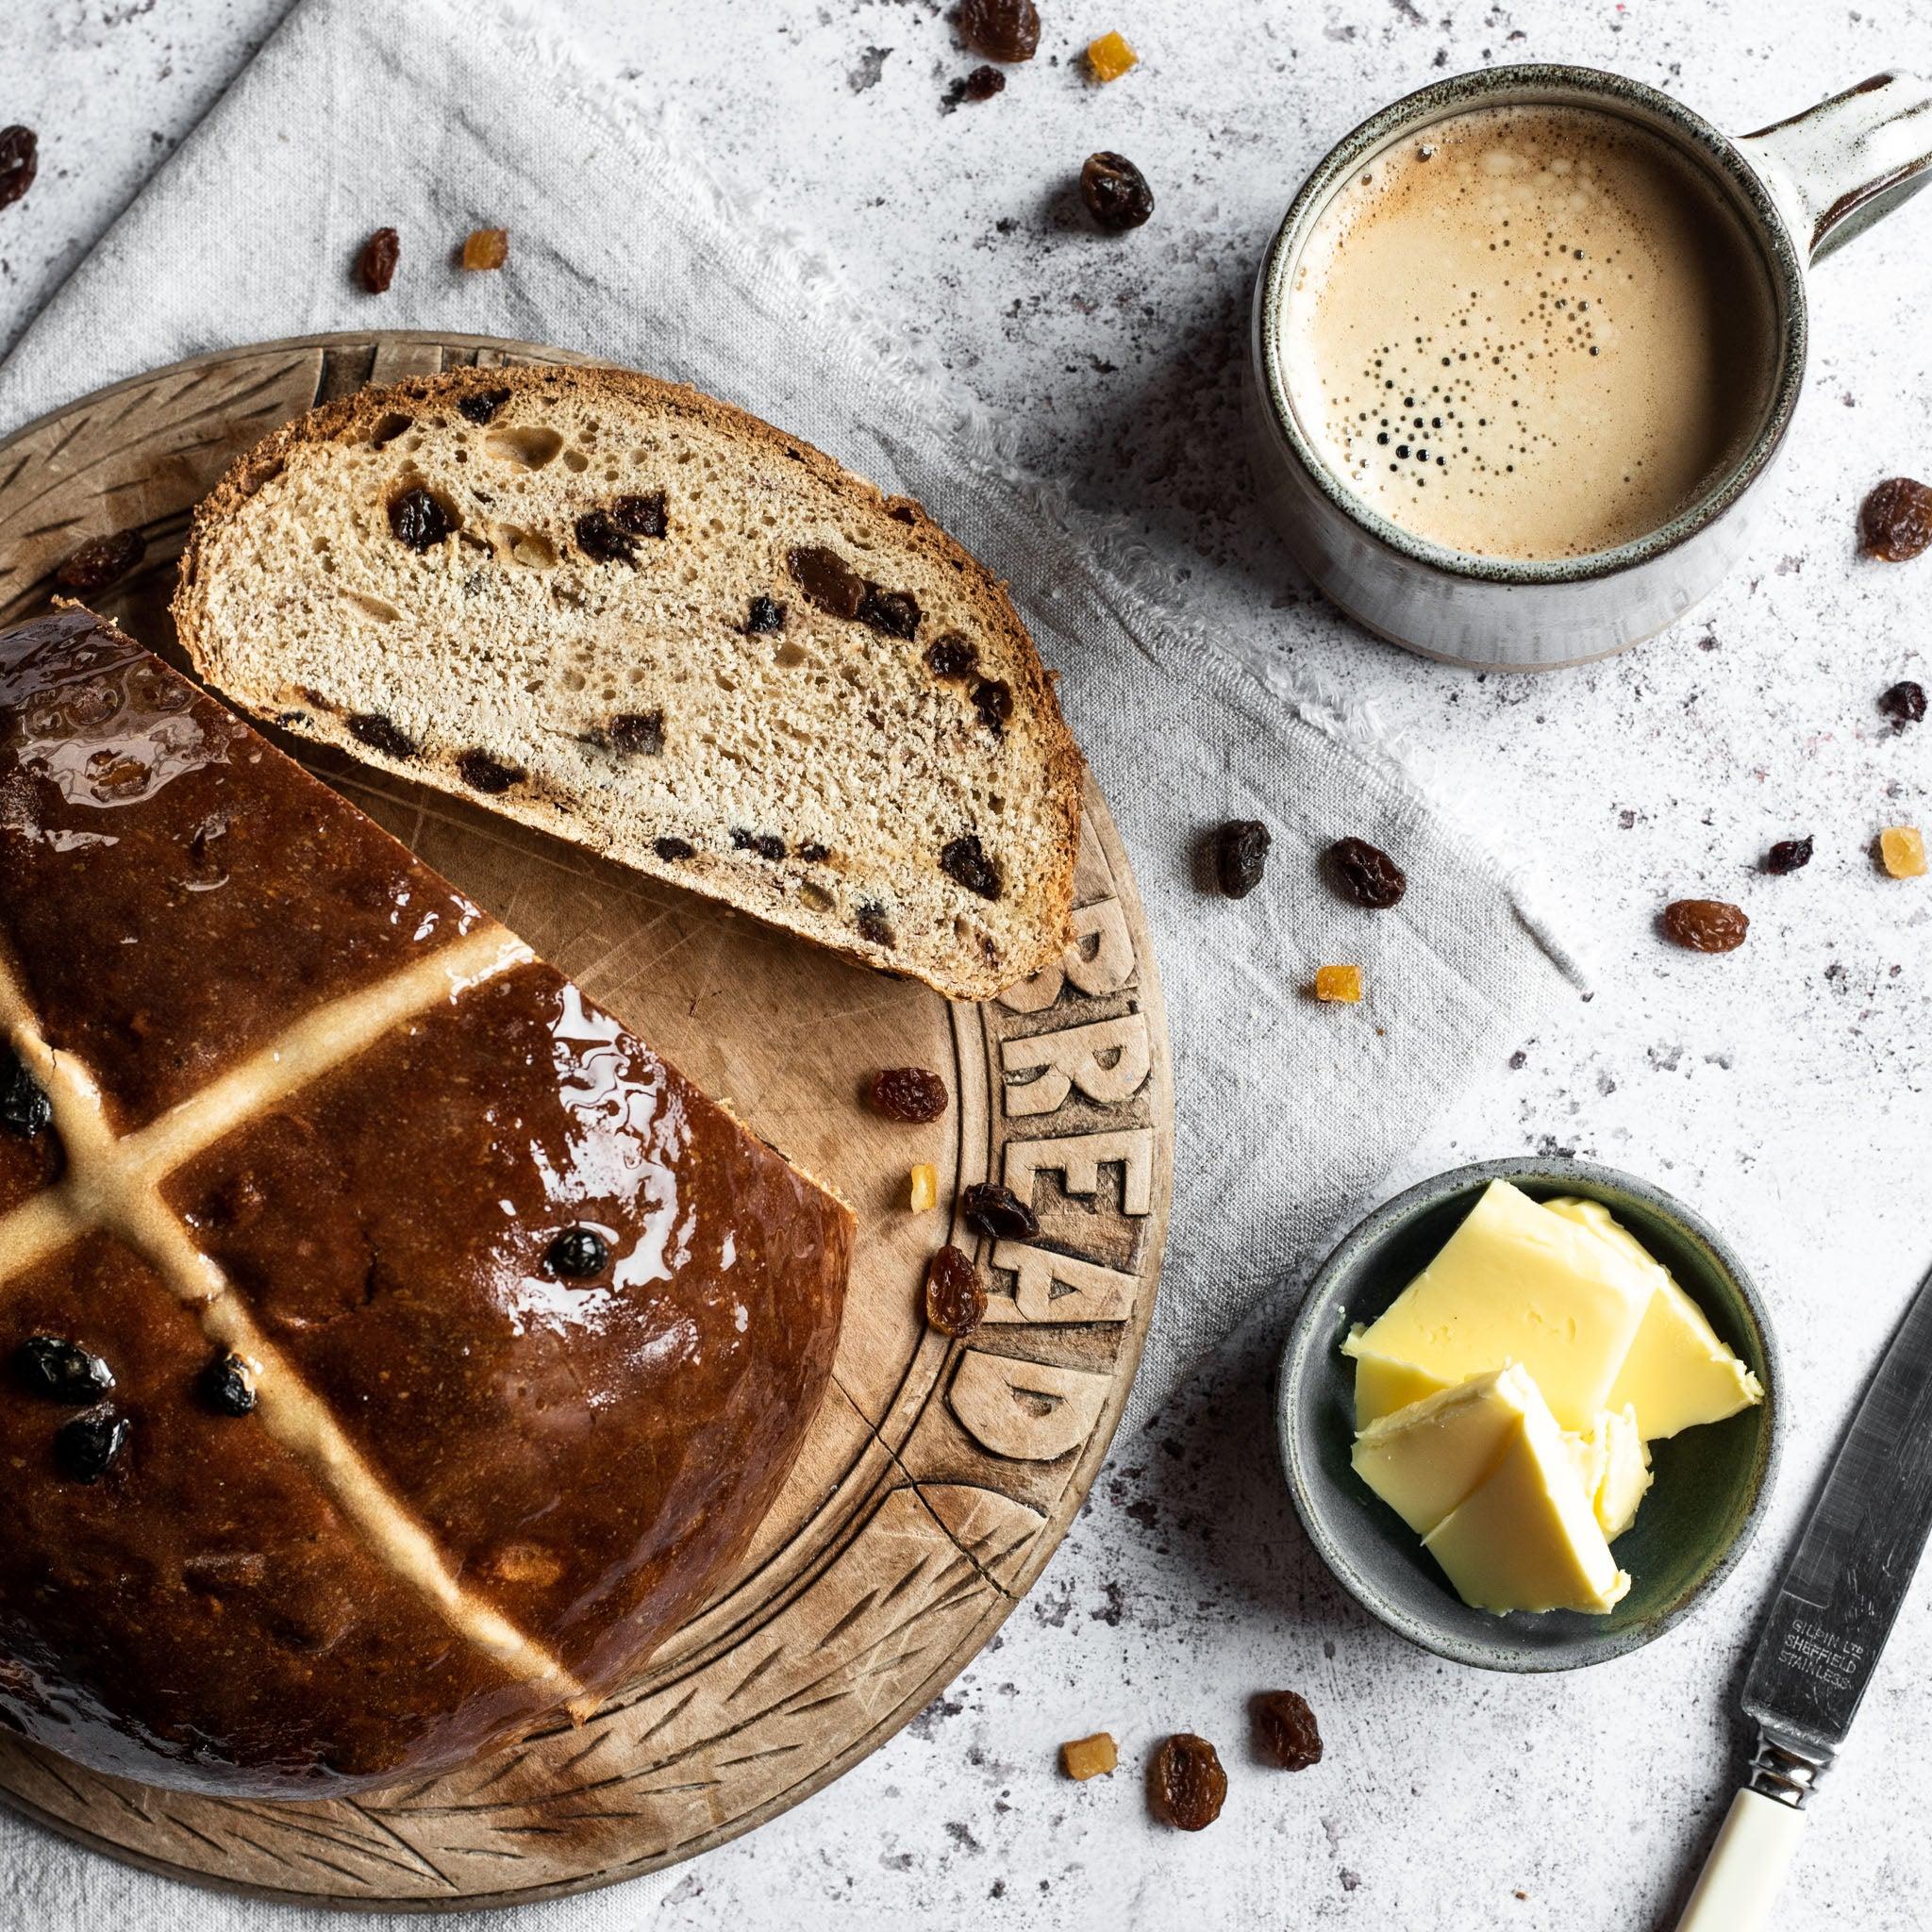 Hot-Cross-Bun-Loaf-SQUARE-5.jpg